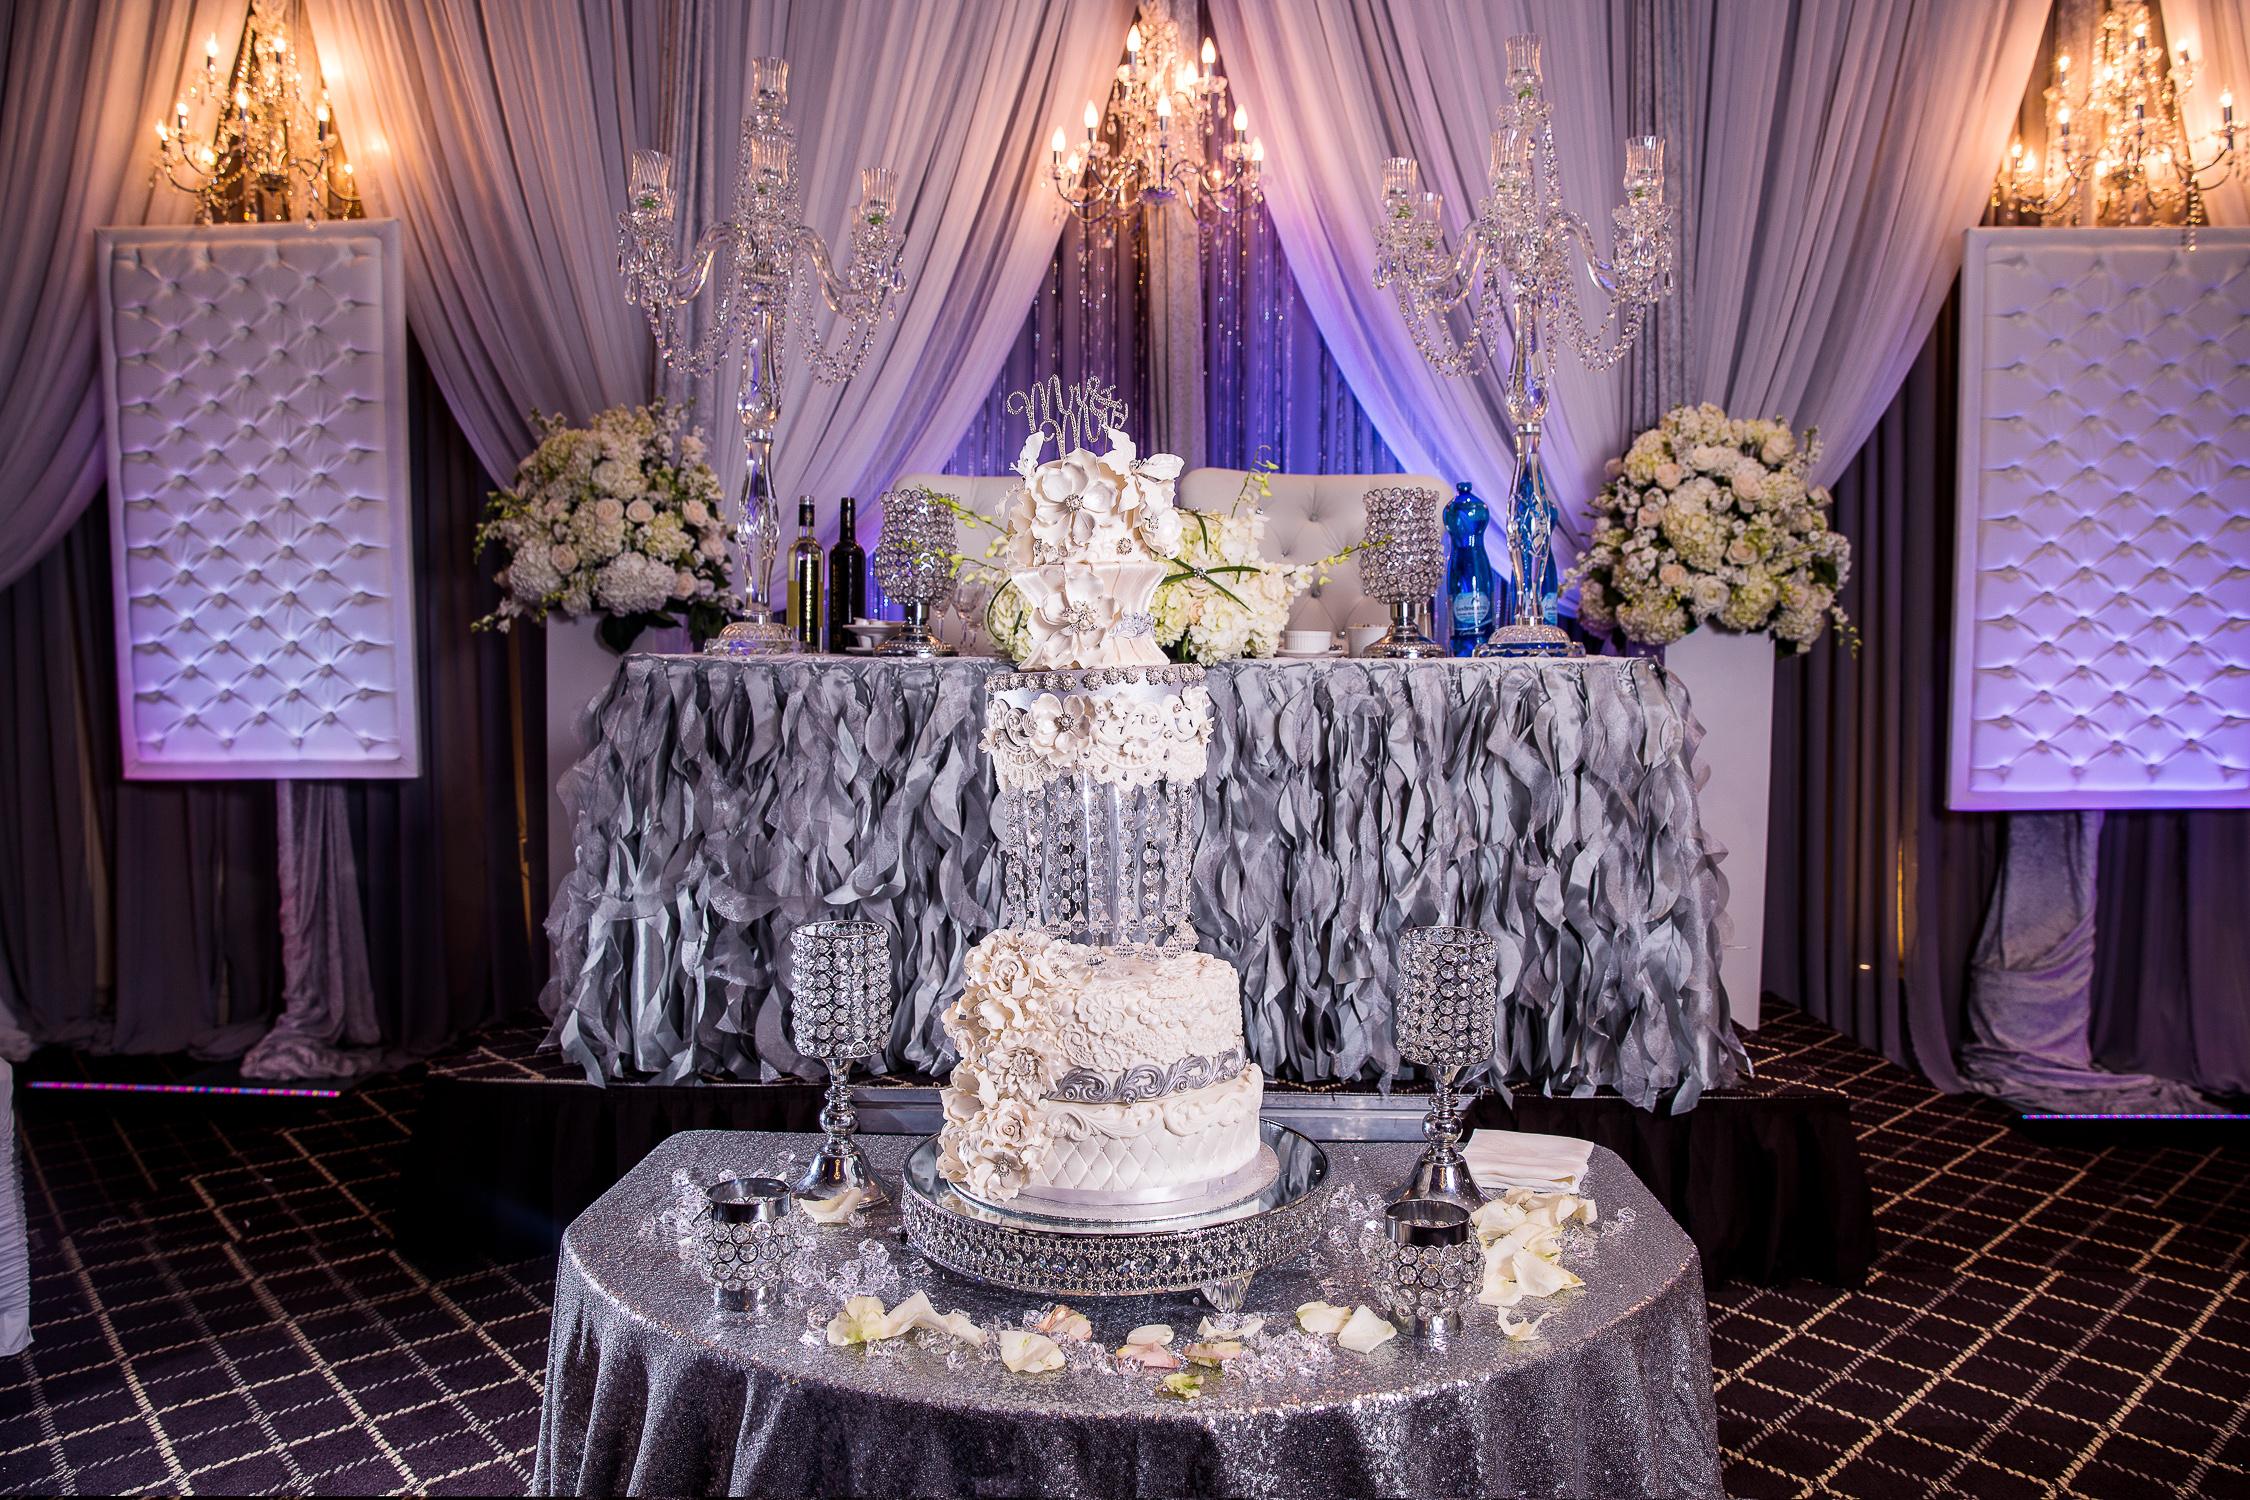 Paradise-Banquet-Hall-Wedding-Vaughan-Ontario-0092.jpg